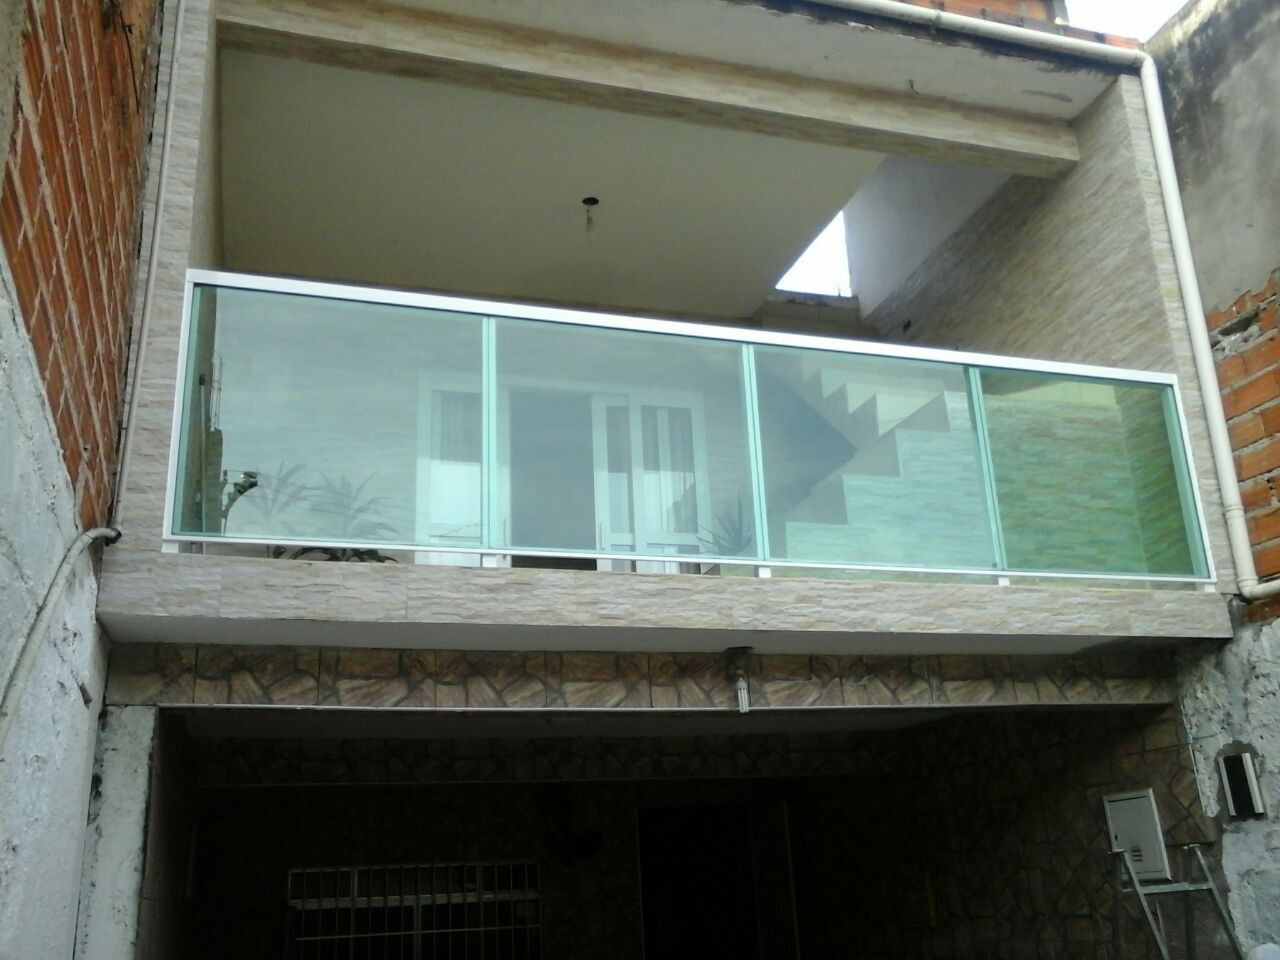 #64462D Empresa de fazer compra de guarda corpo de vidro temperado na Mooca 354 Janelas De Vidro Temperado Preço Zona Leste